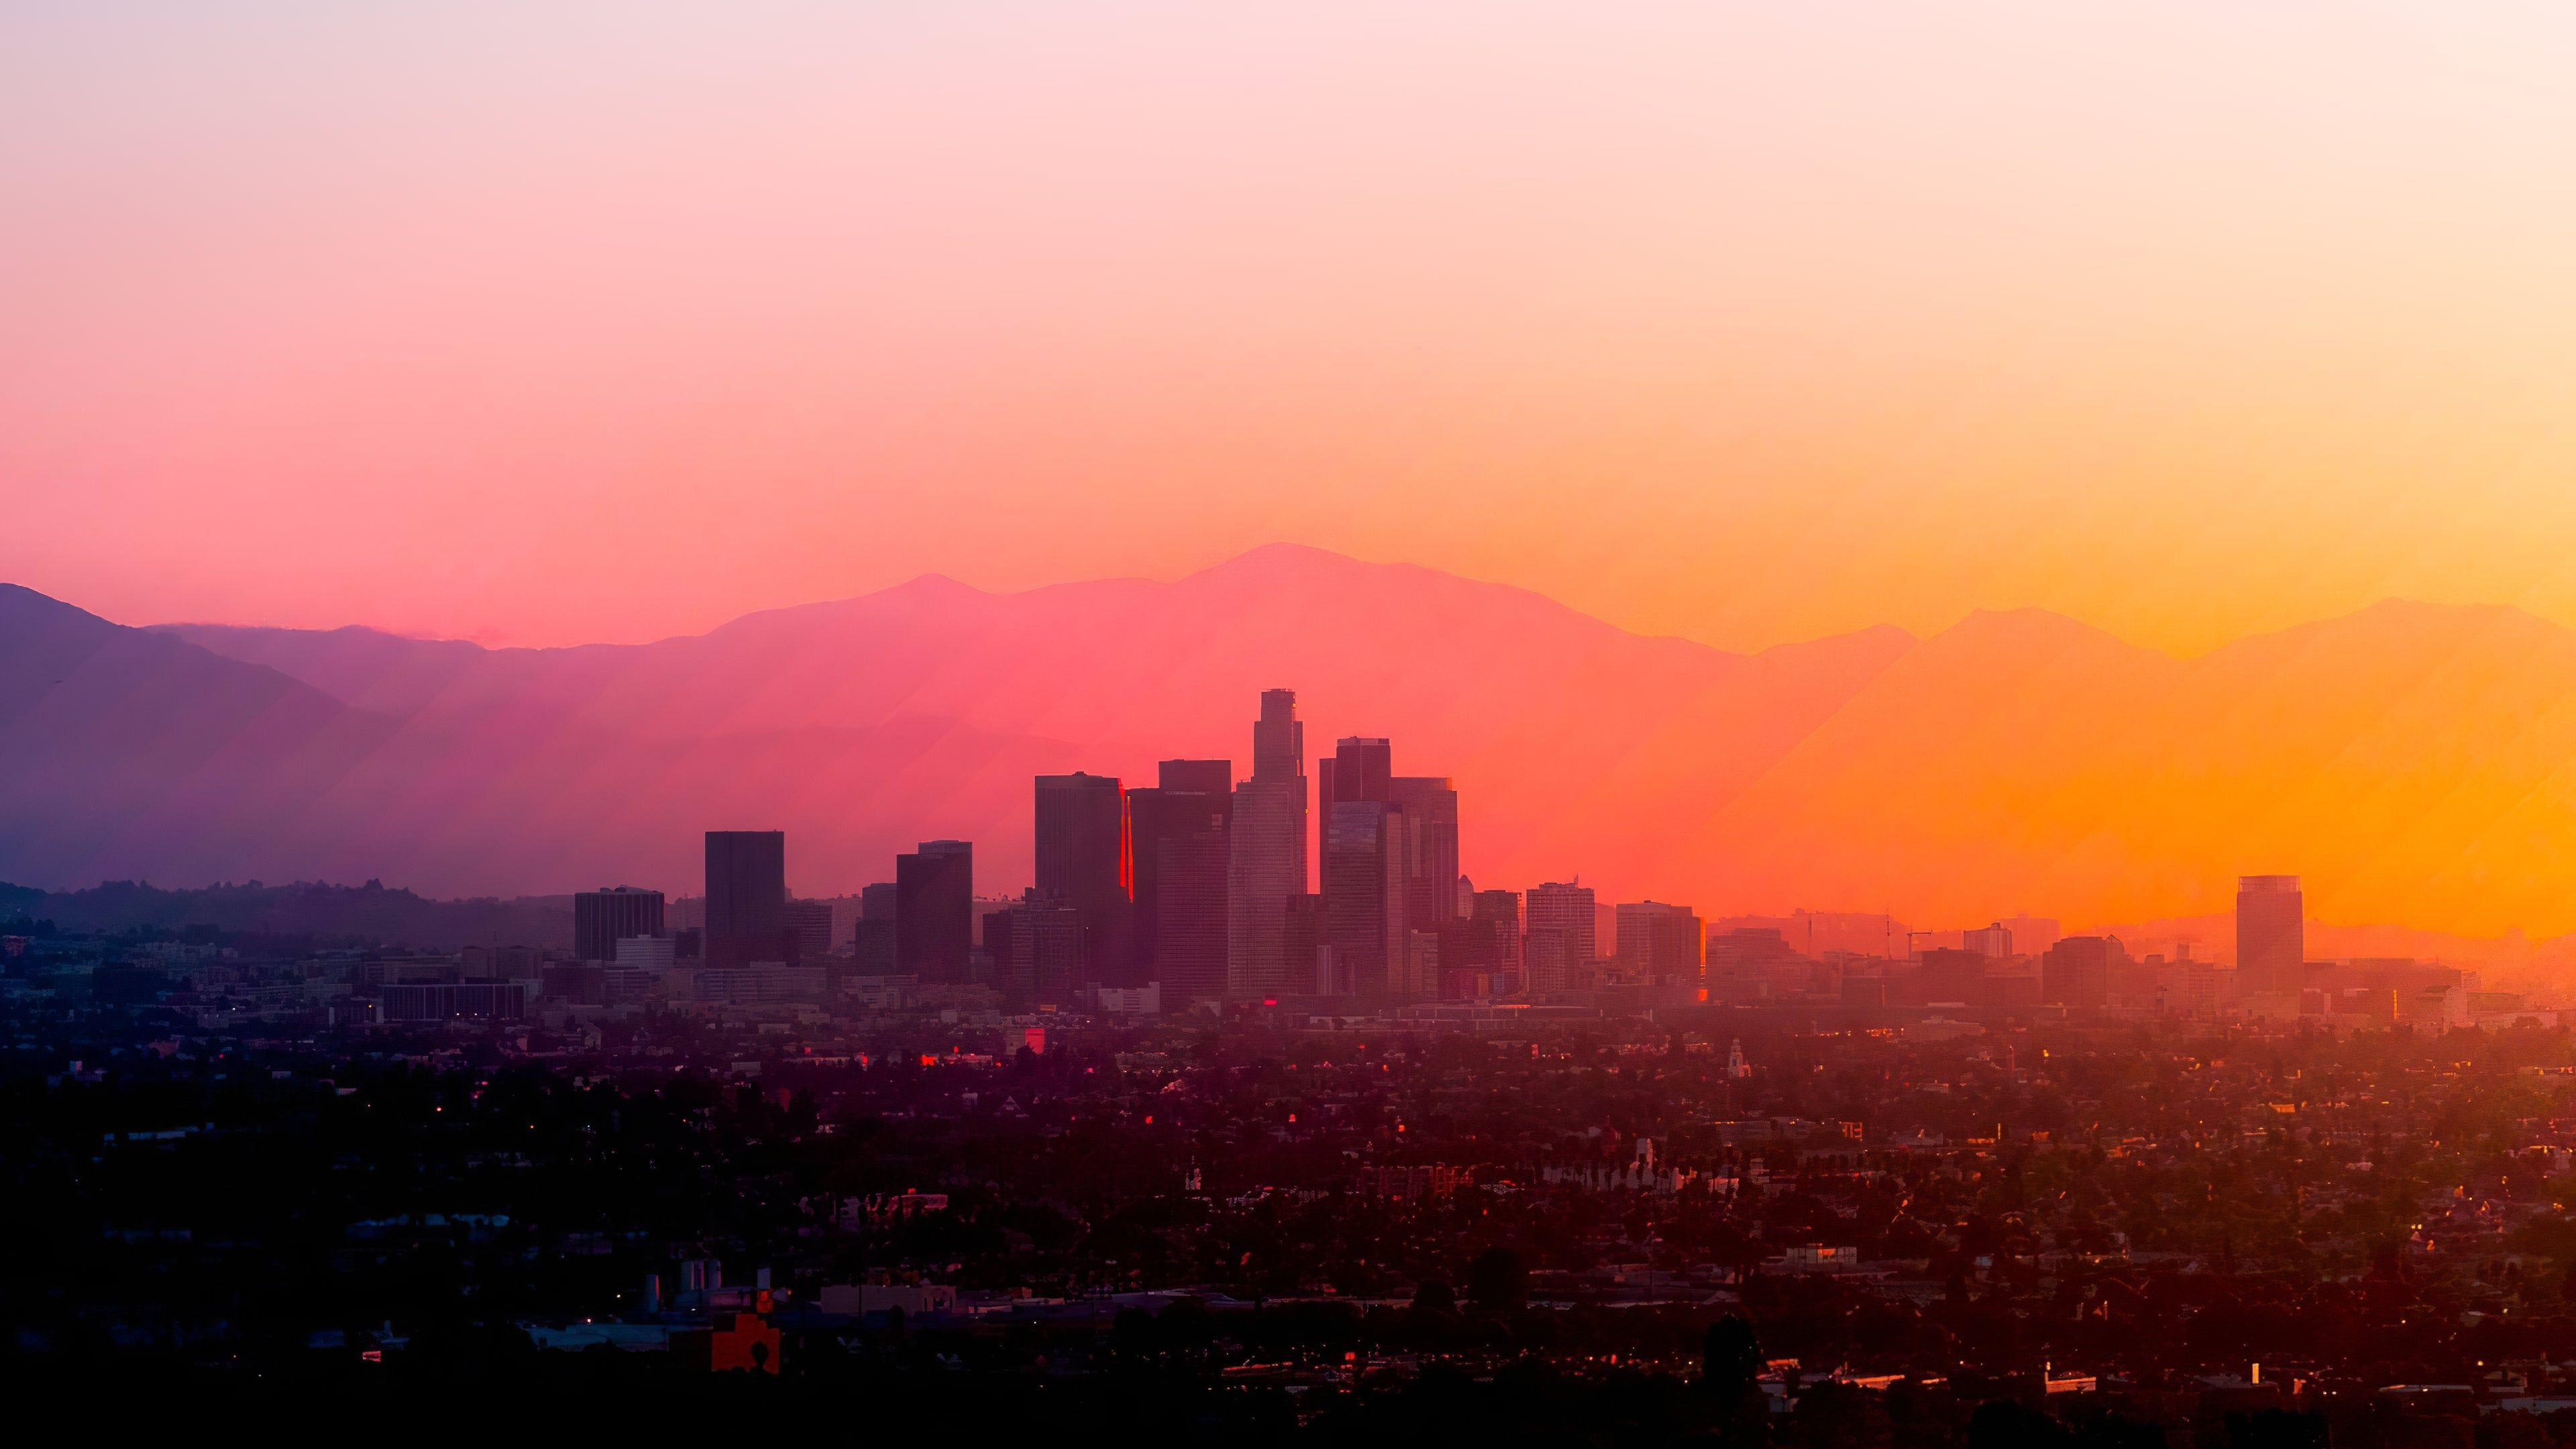 Los Angeles 4k Wallpaper In 2020 Los Angeles Wallpaper Desktop Background Images Background Images